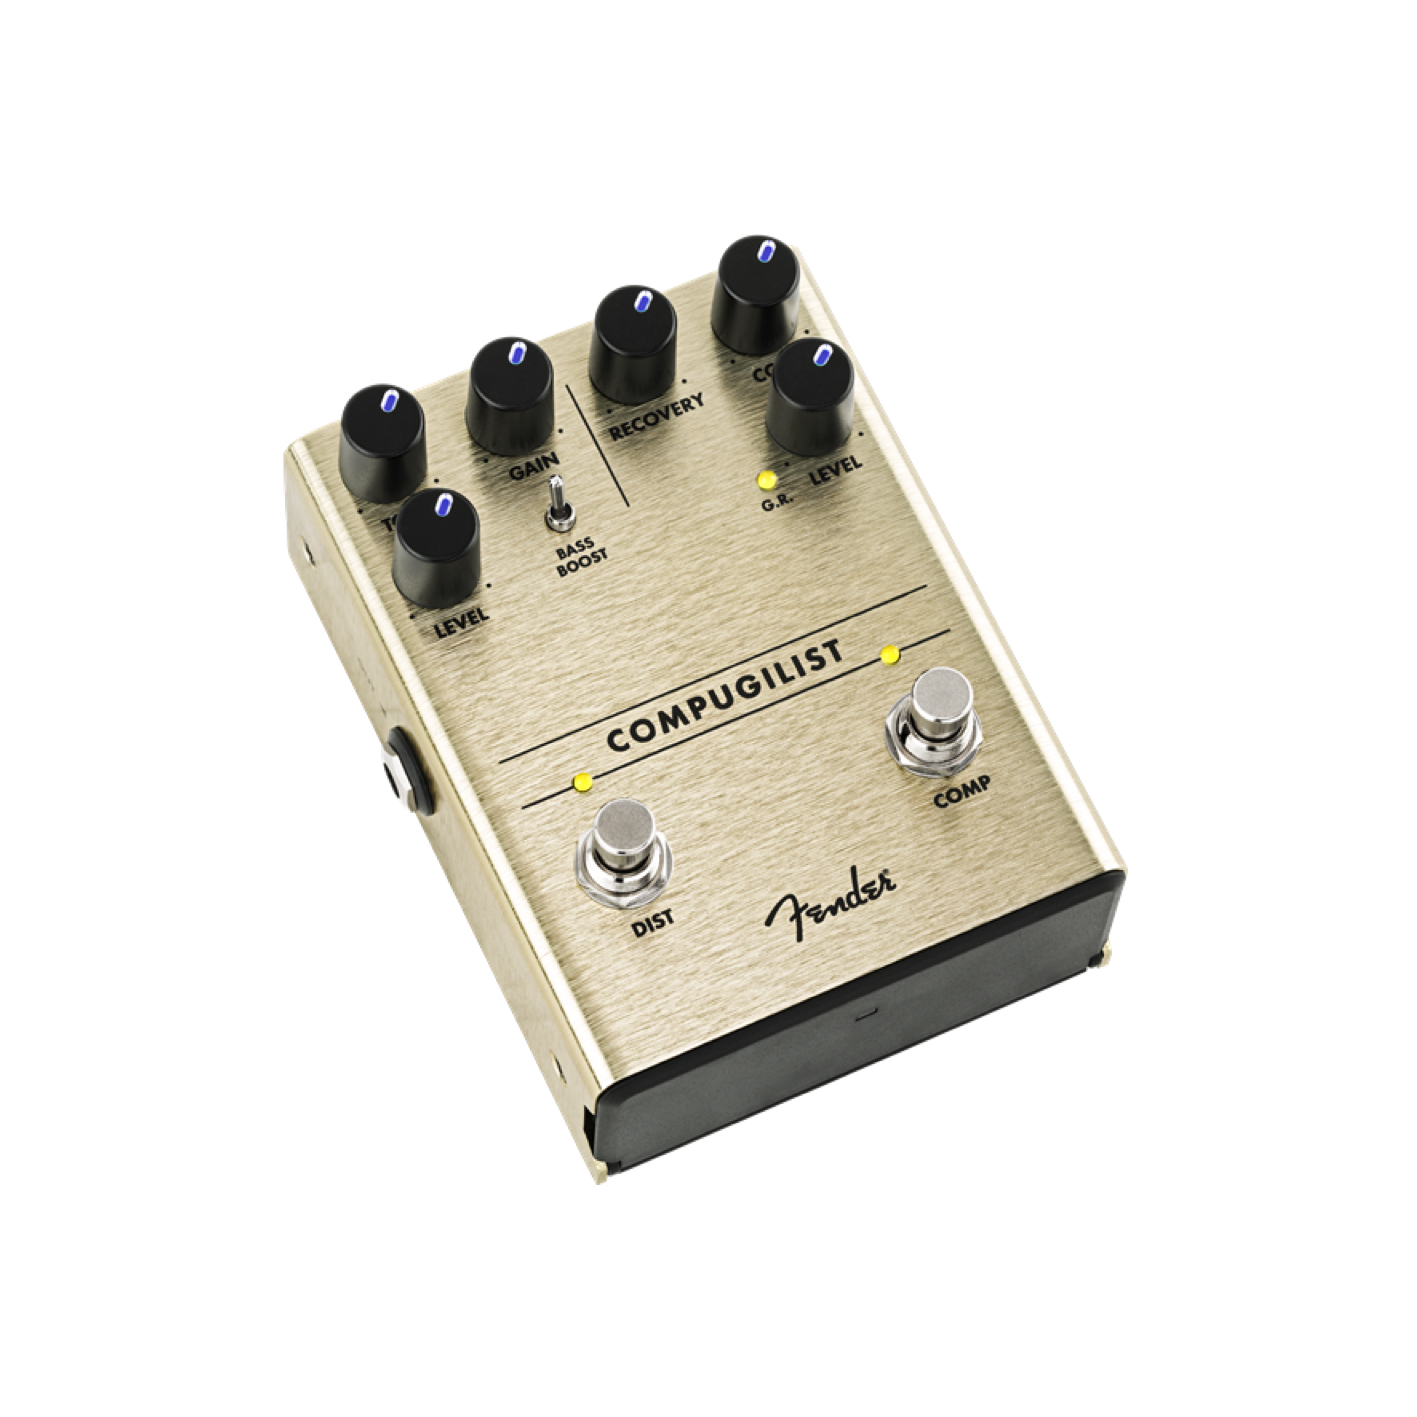 Fender Compugilist Compressor